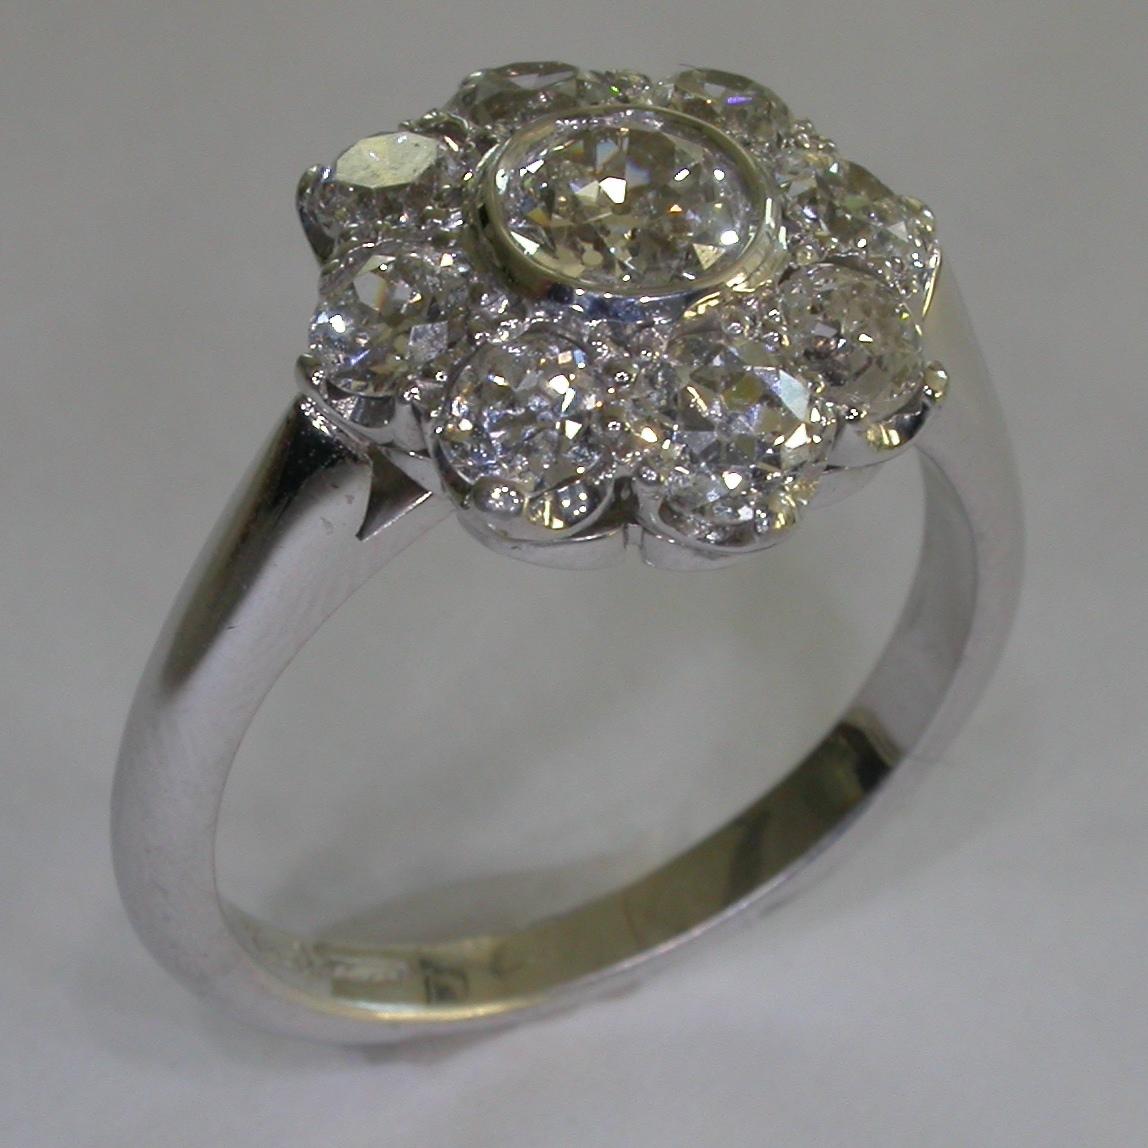 Vintage Engagement Ring - #7130